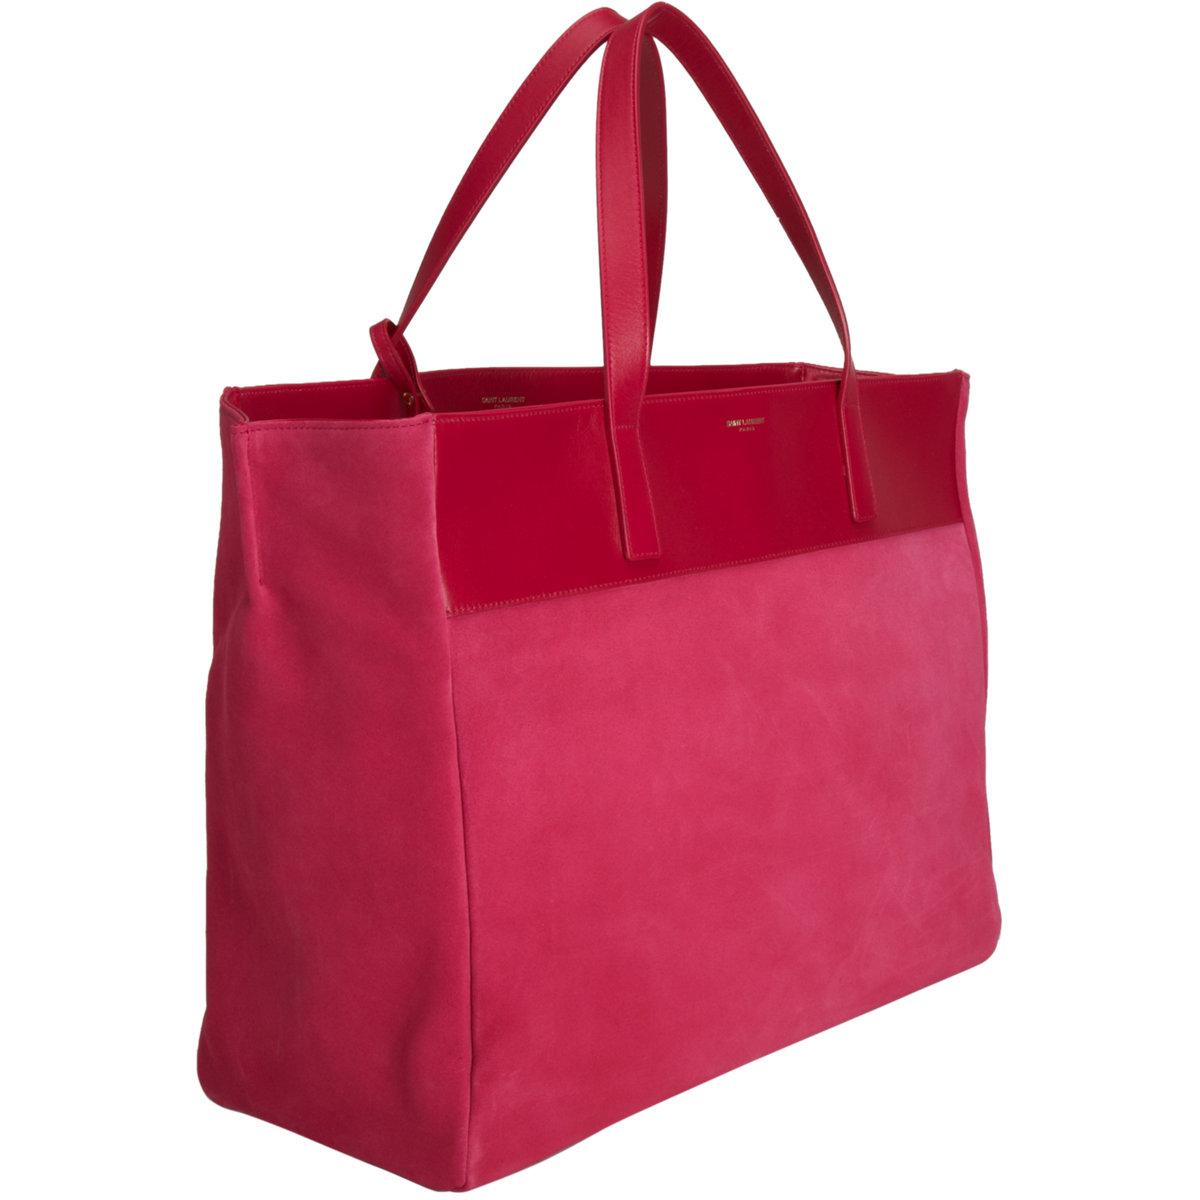 lyst saint laurent reversible shopper tote in pink. Black Bedroom Furniture Sets. Home Design Ideas